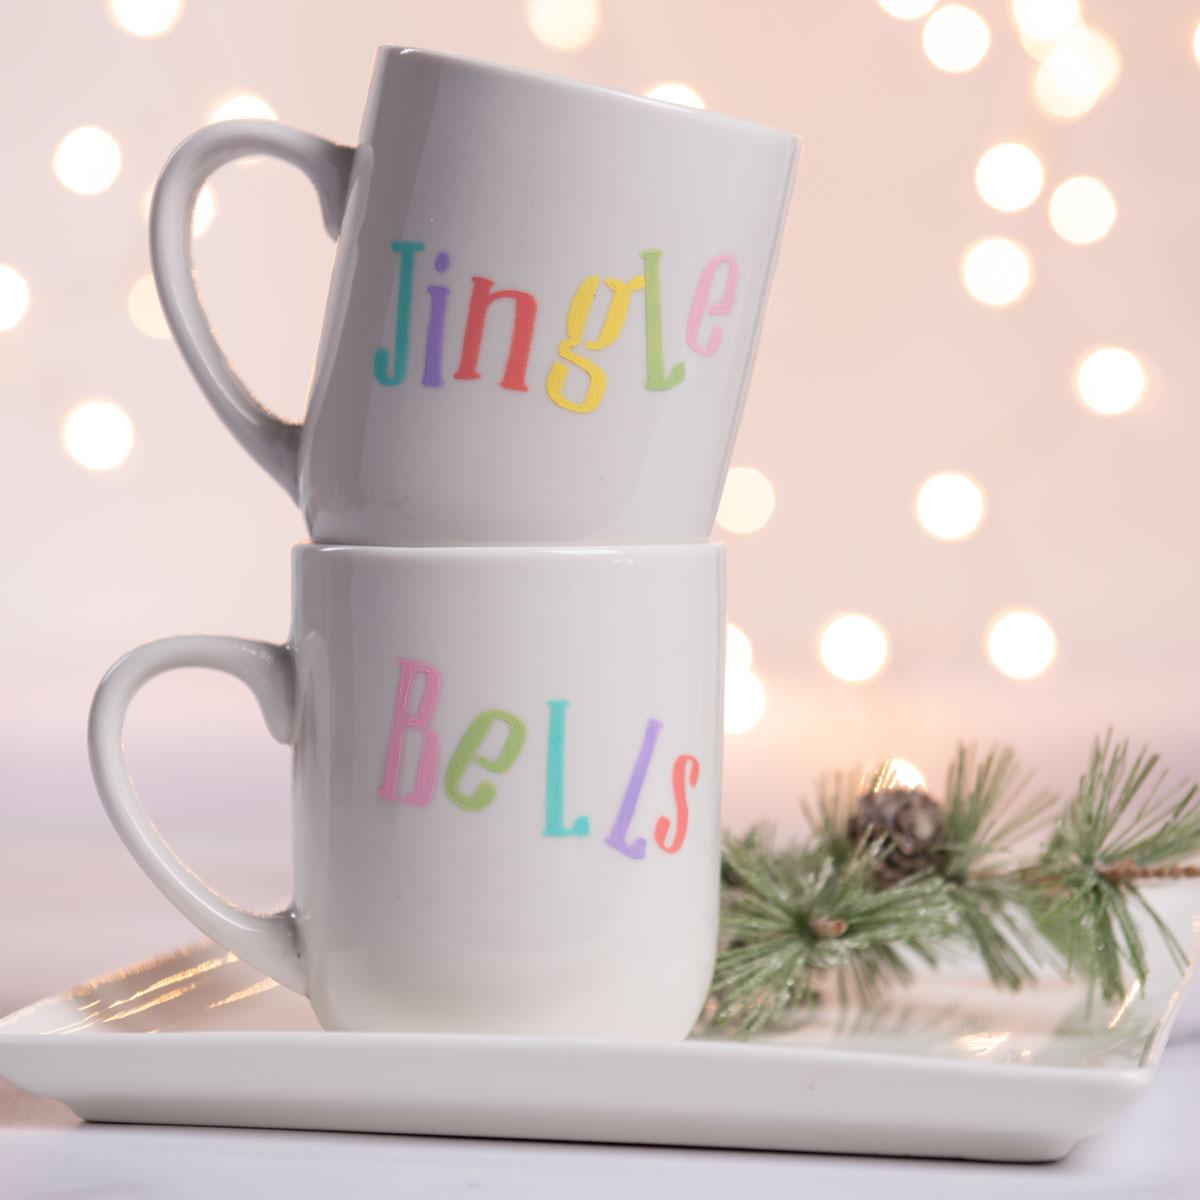 Jingle Bells DIY Painted Mugs